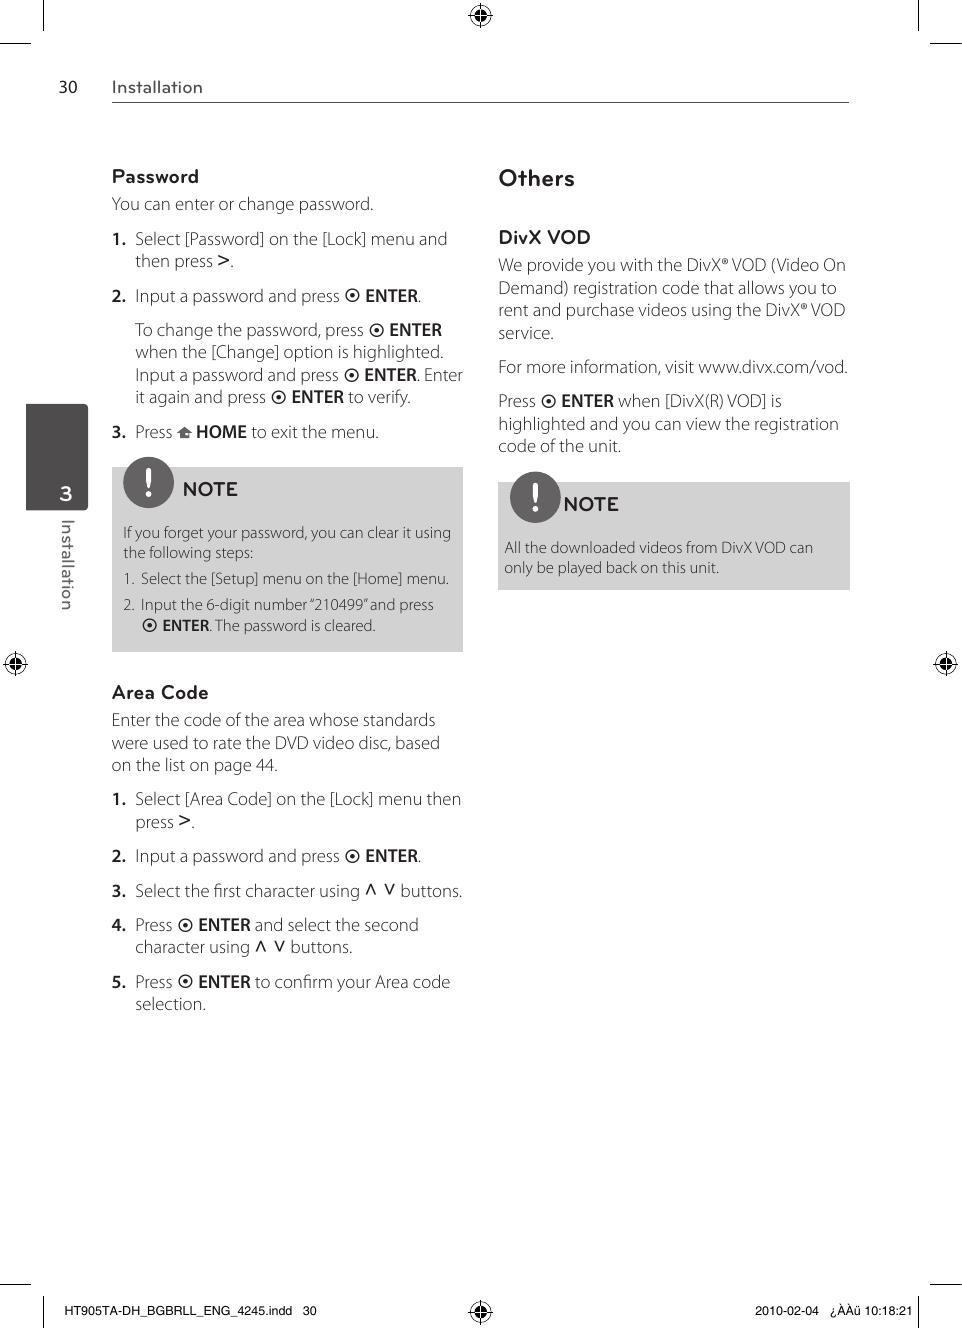 Lg Ht905Ta Owner S Manual DH_BGBRLL_ENG_4245